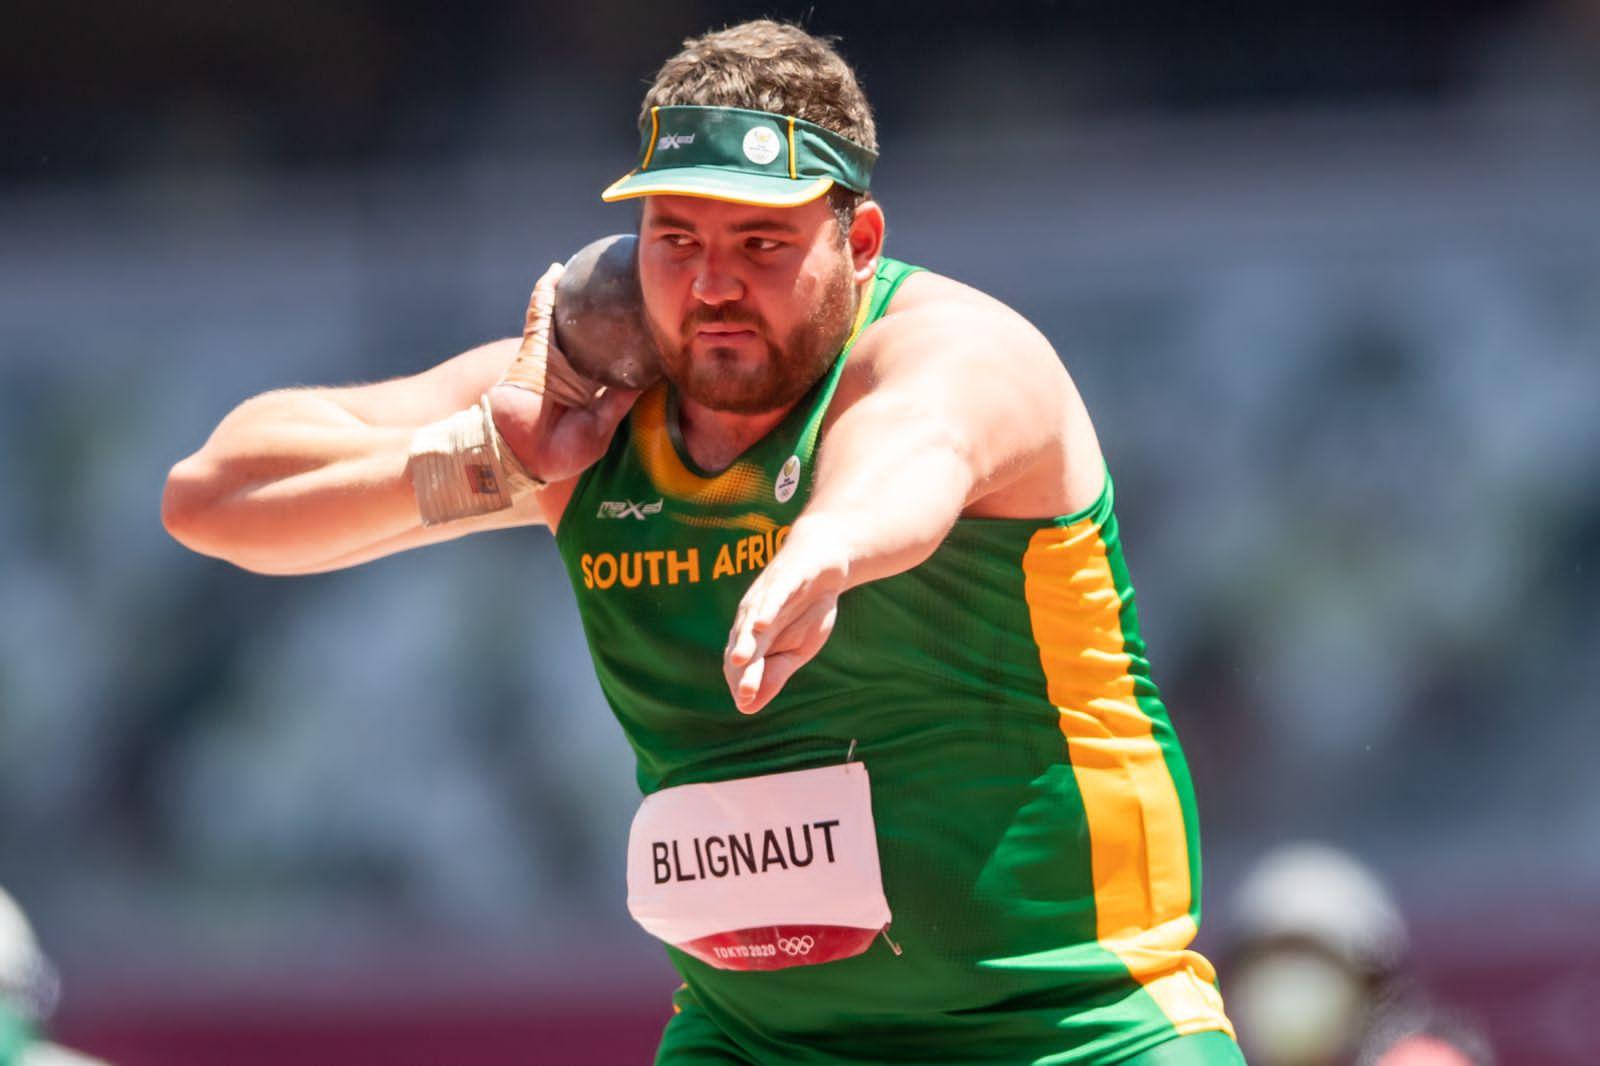 Kyle Blignaut